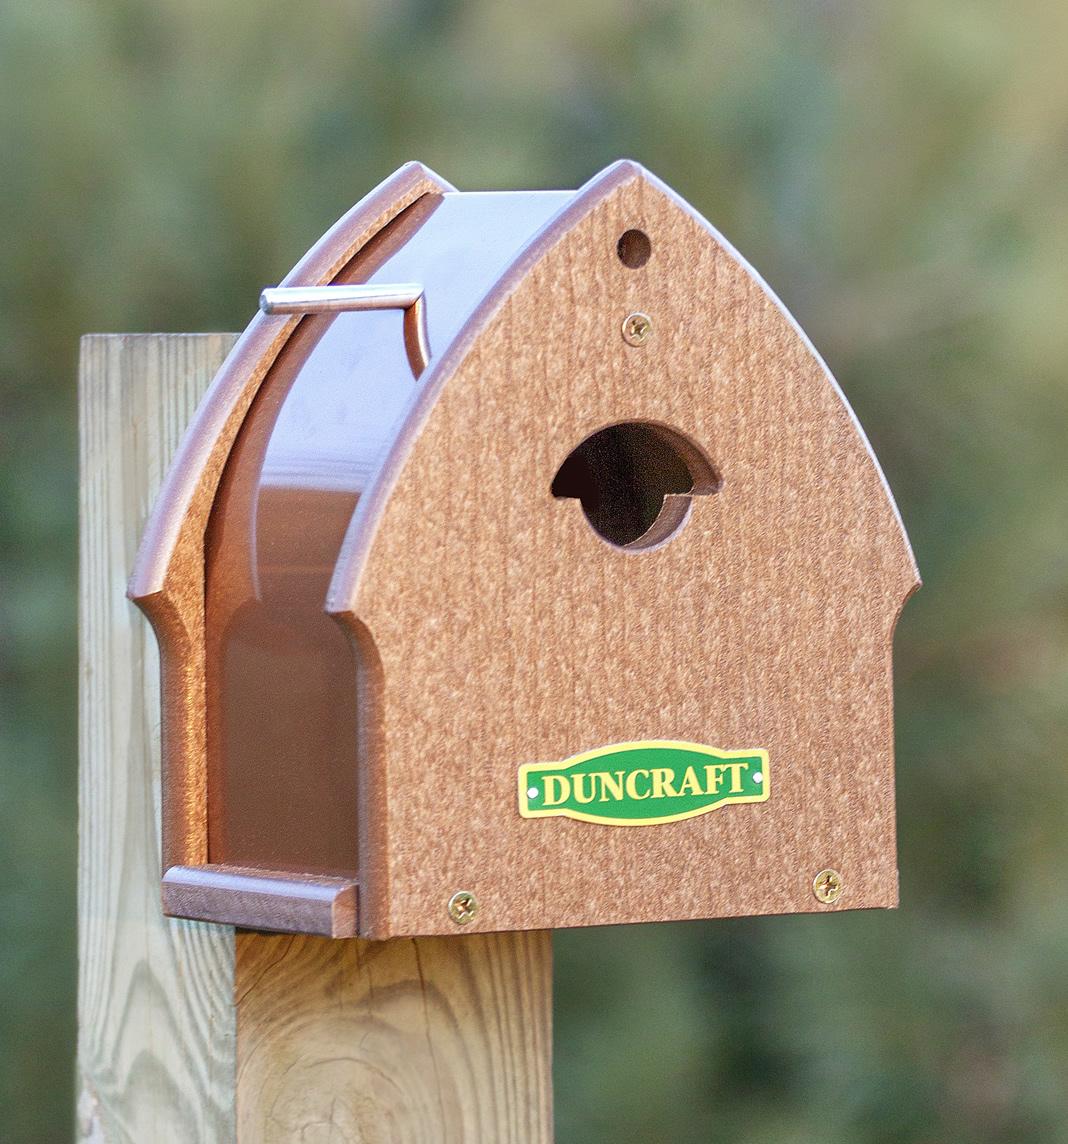 Birdhouse Duncraftcom Duncraft The Chickadee Enterprise Bird House